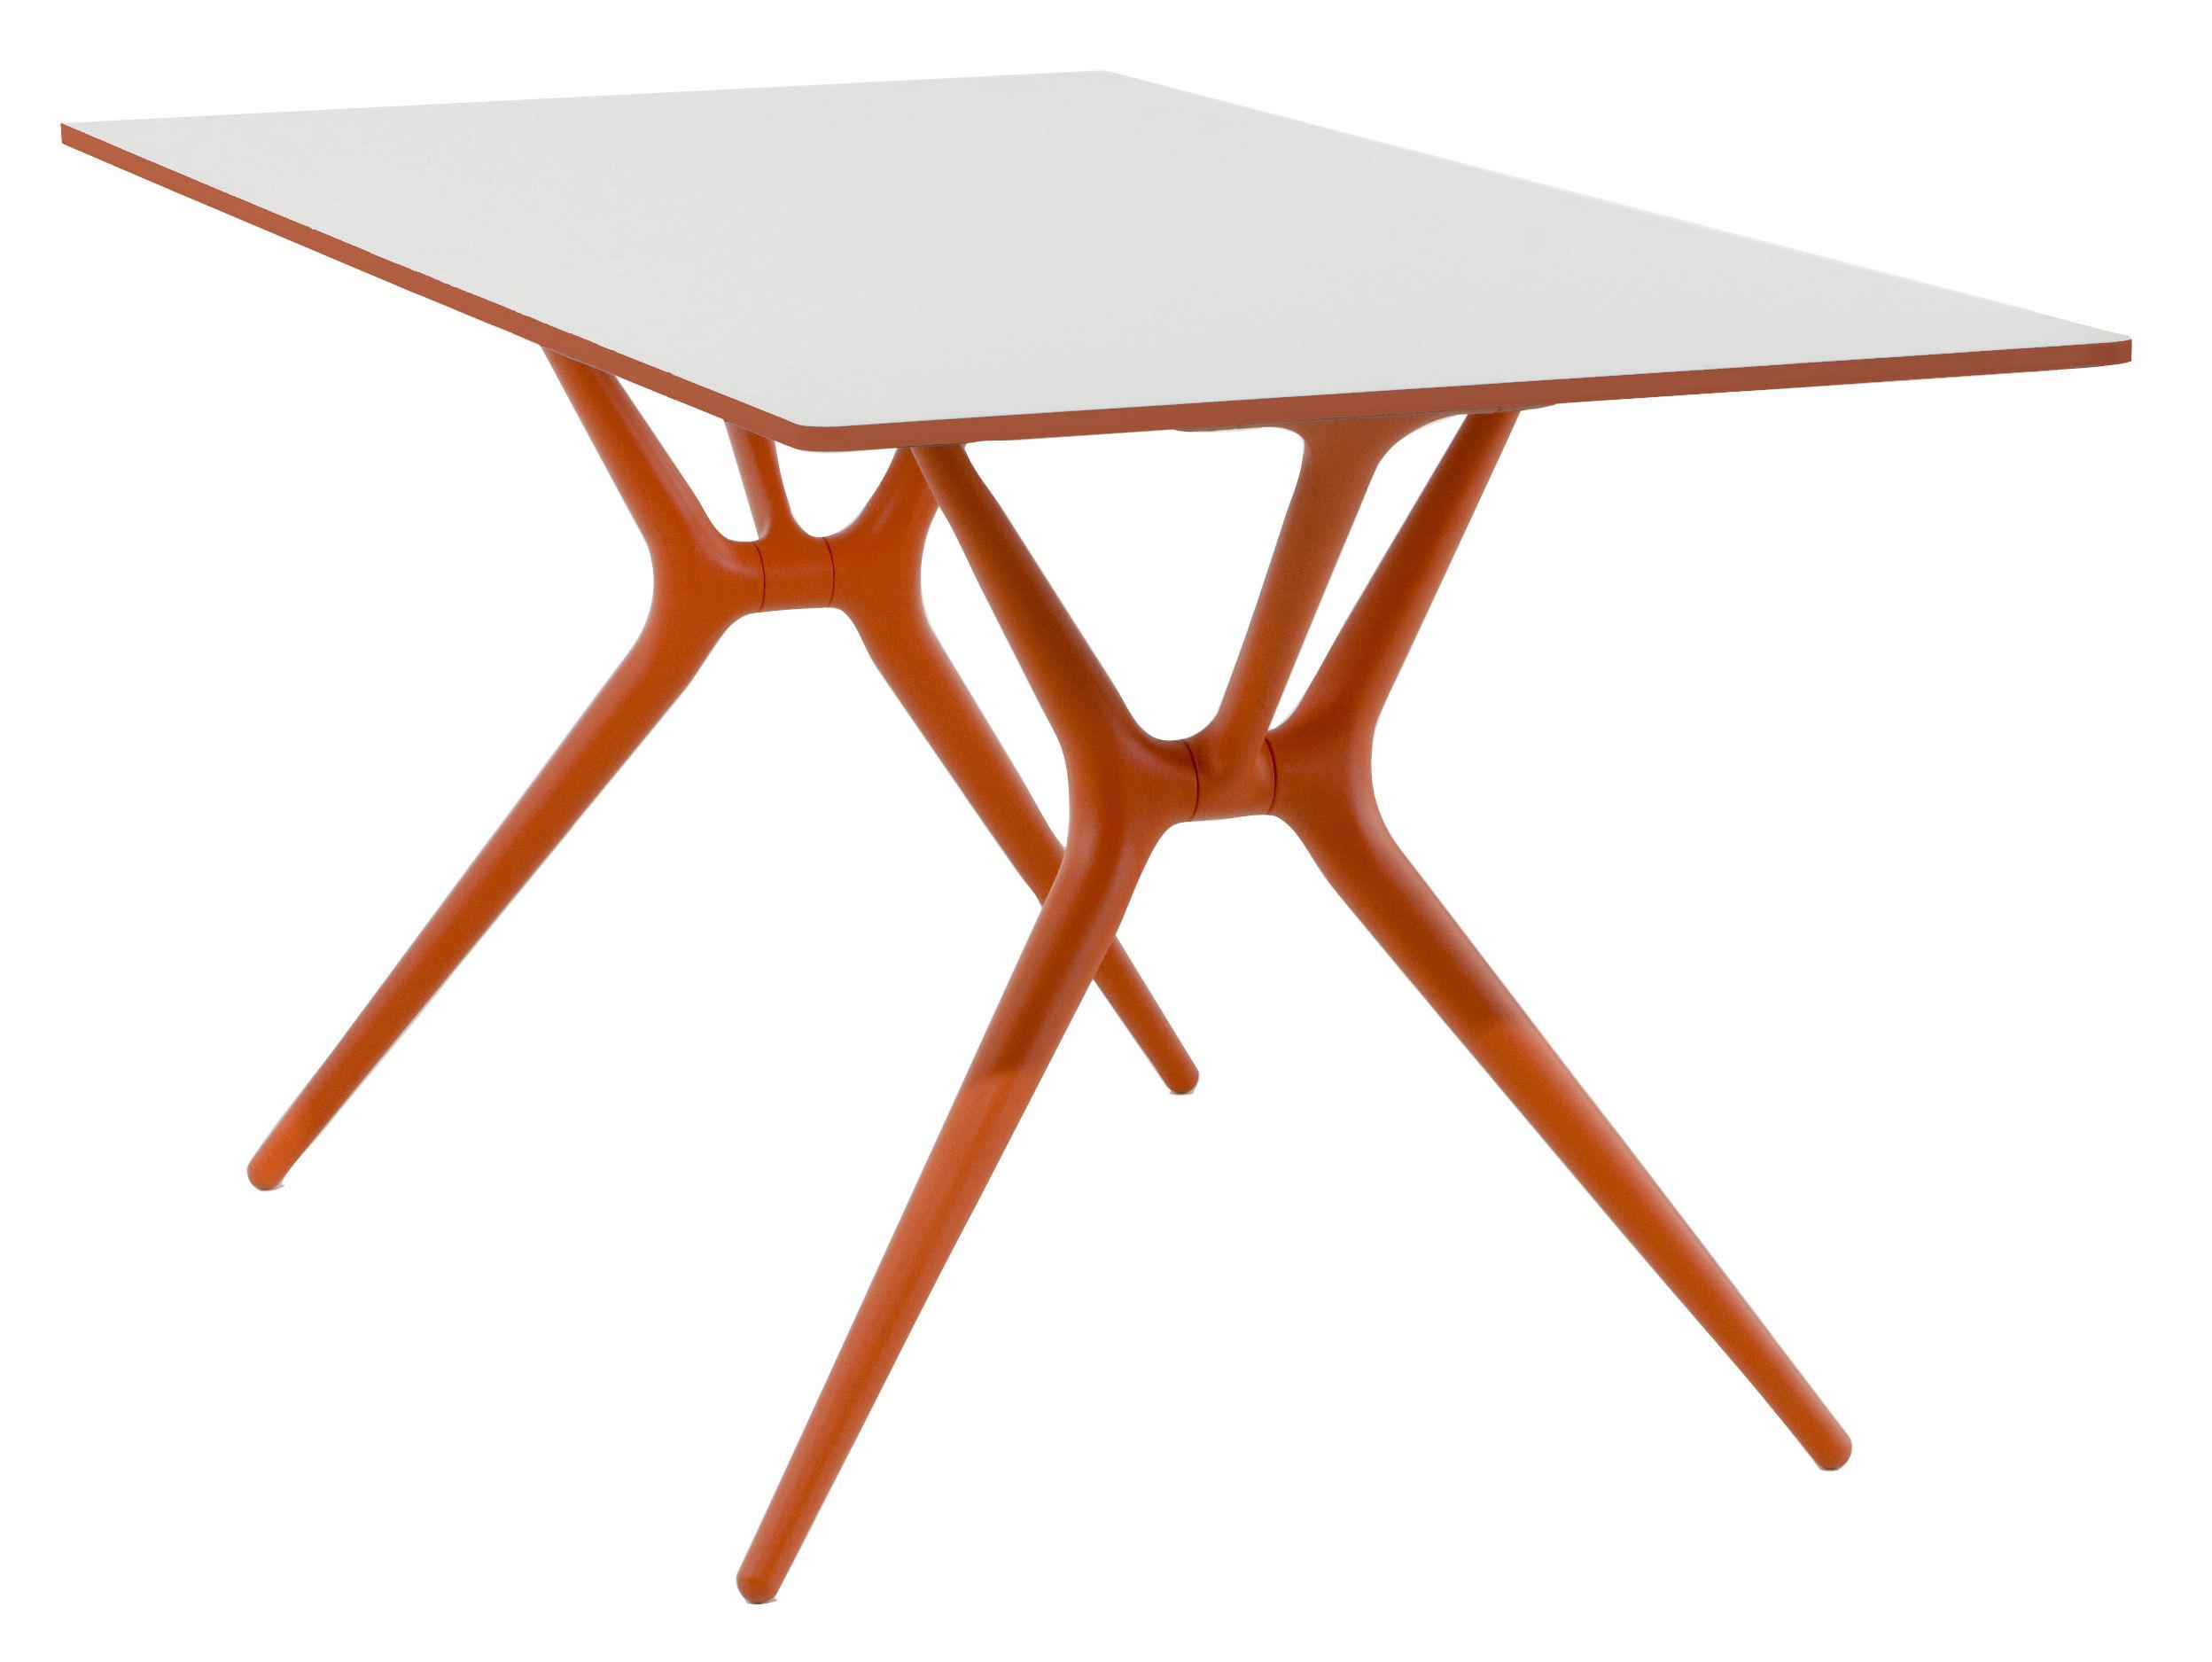 table pliante spoon bureau 200 x 90 cm plateau blanc pieds orange kartell. Black Bedroom Furniture Sets. Home Design Ideas